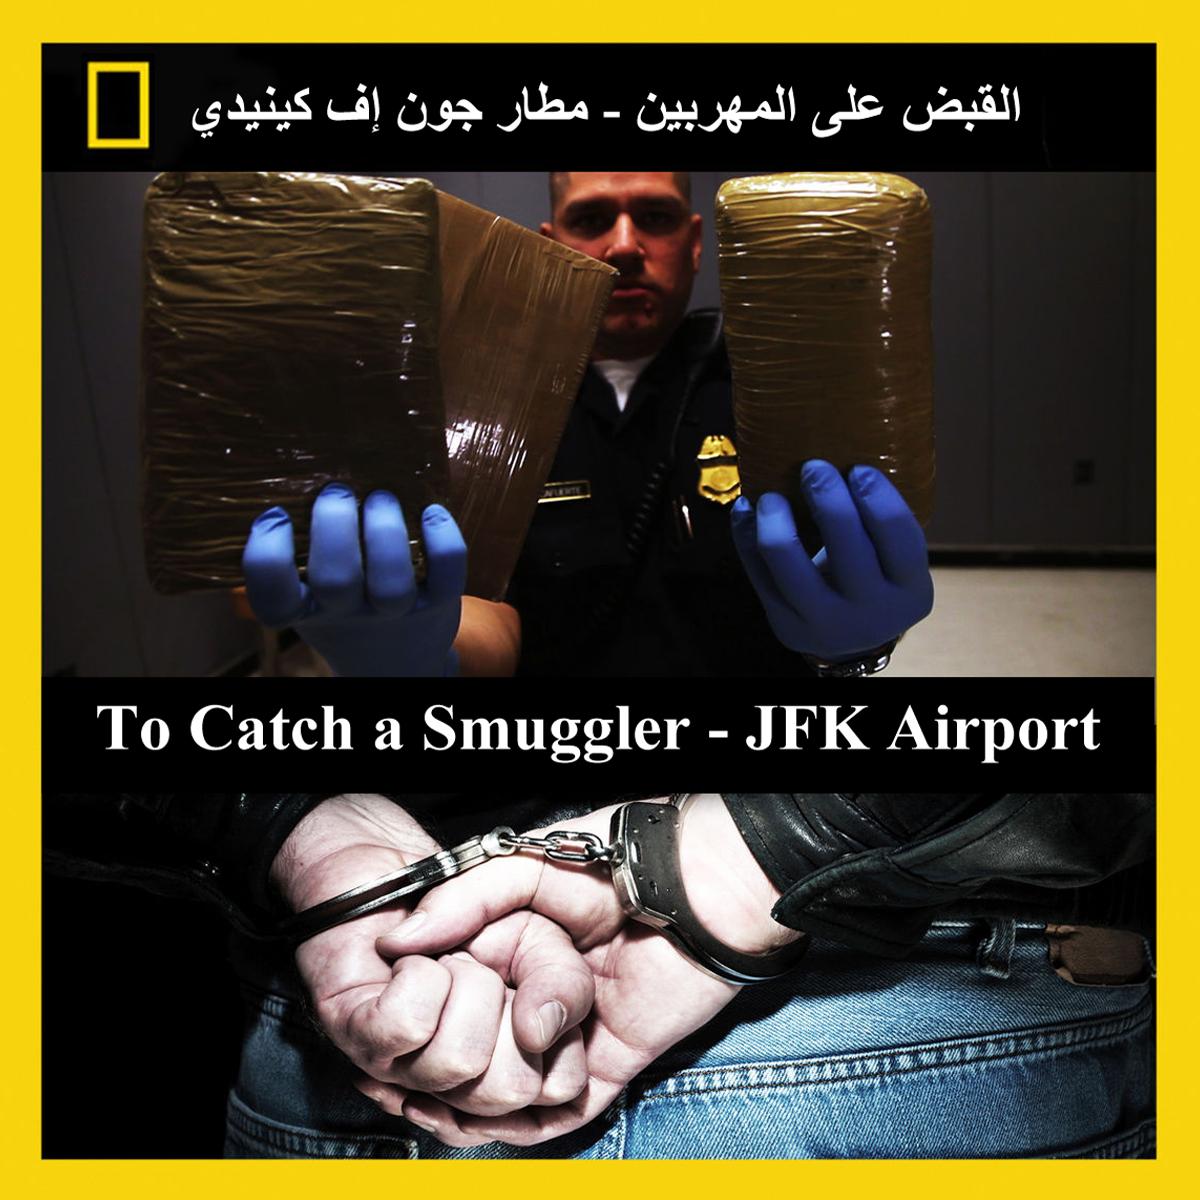 HDTV-1080p | القبض على المهربين: مطار جون إف كينيدي - من مهرب إلى رئيس عصابة -- Seeders: 1 -- Leechers: 0